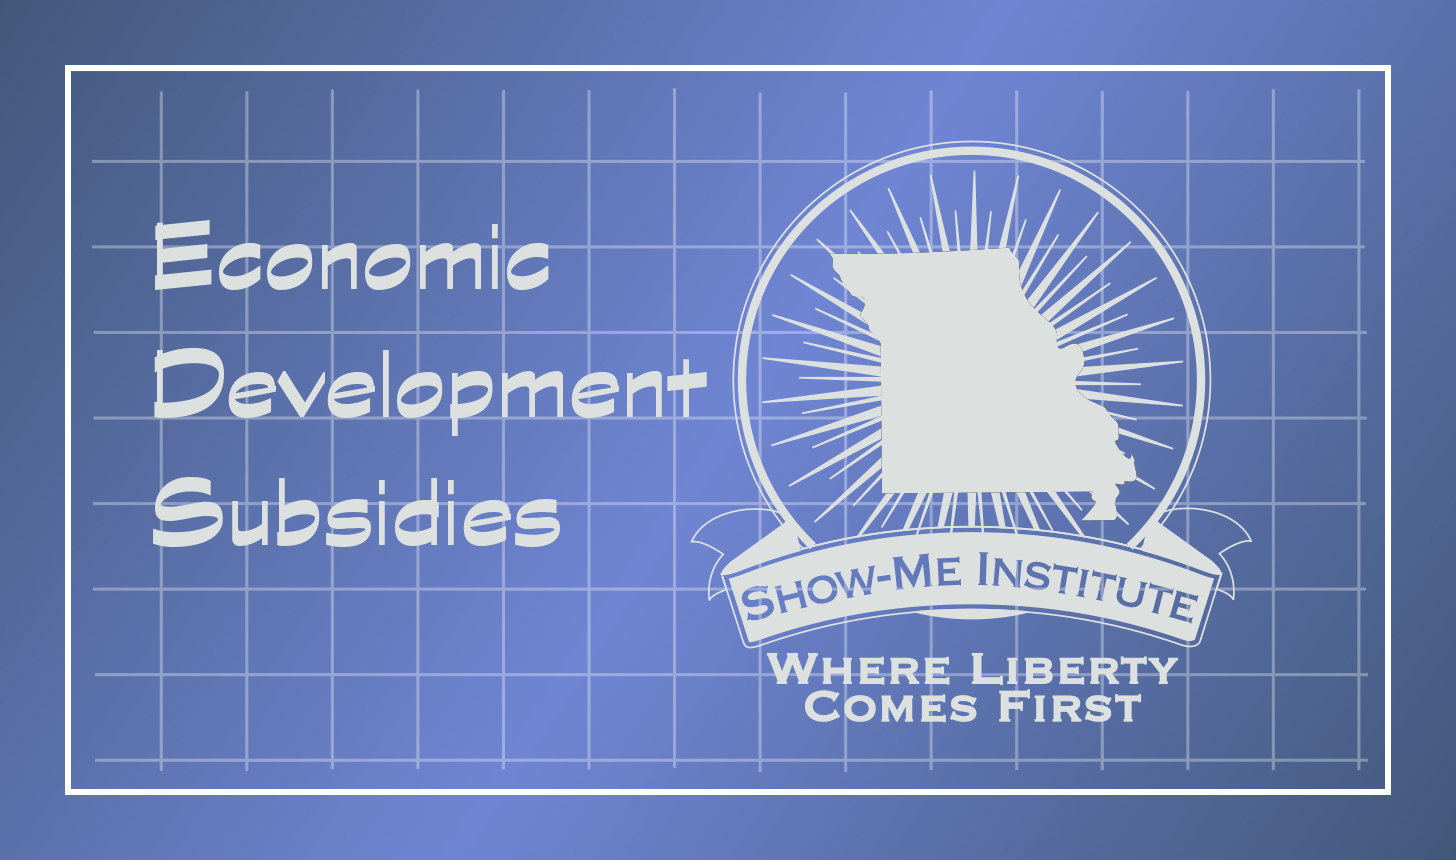 2018 blueprint economic development subsidies show me institute 2018 blueprint economic development subsidies malvernweather Choice Image